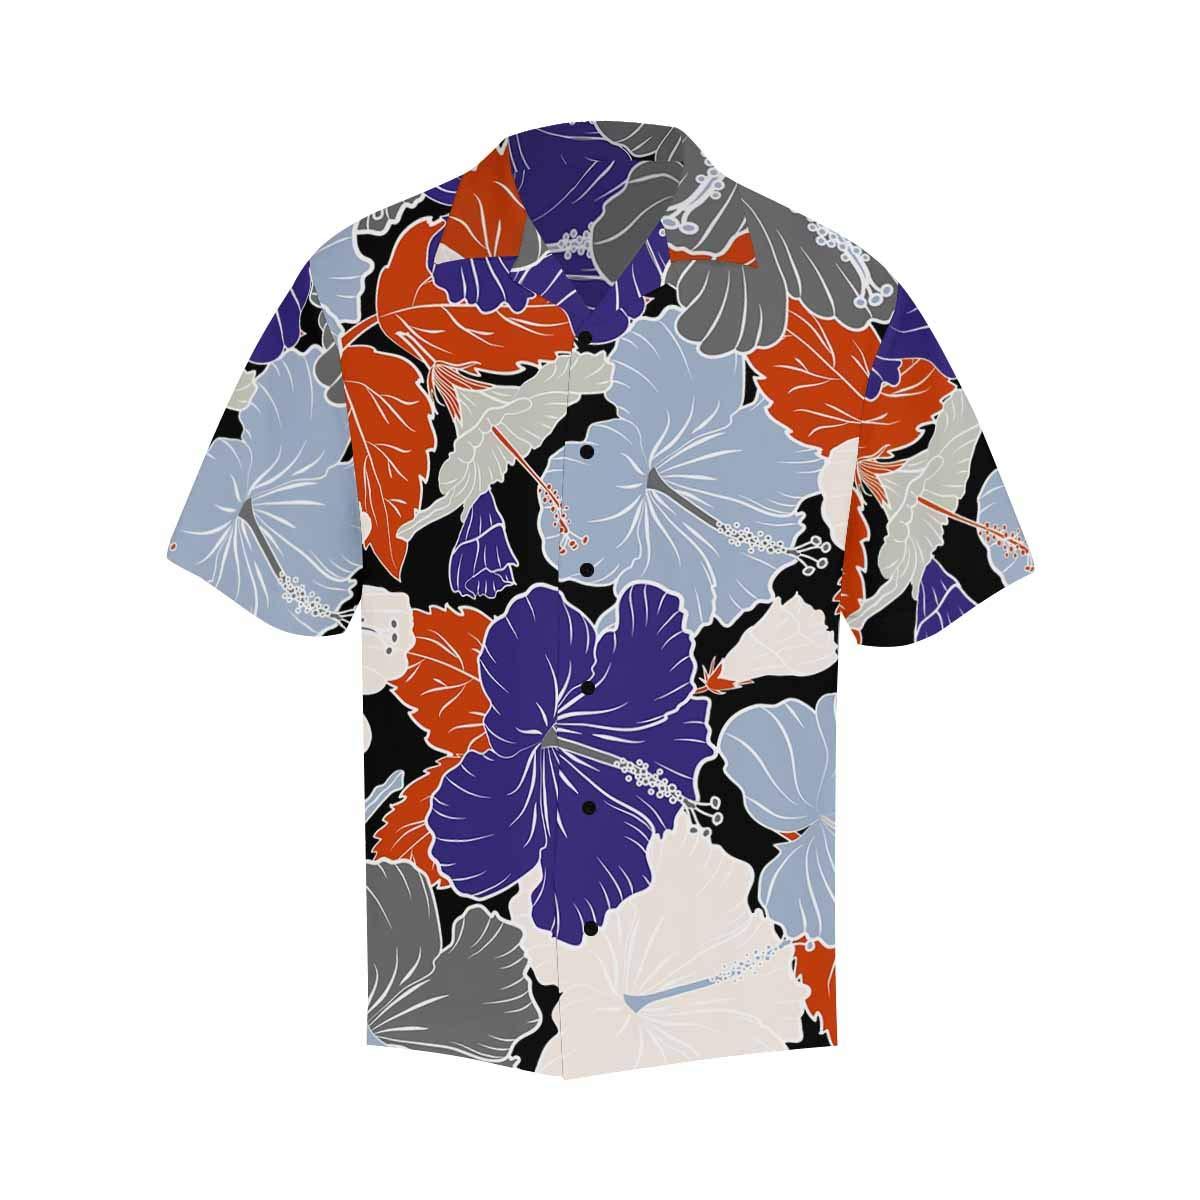 InterestPrint Printed Violet Flowers Summer Printed Shirt for Men